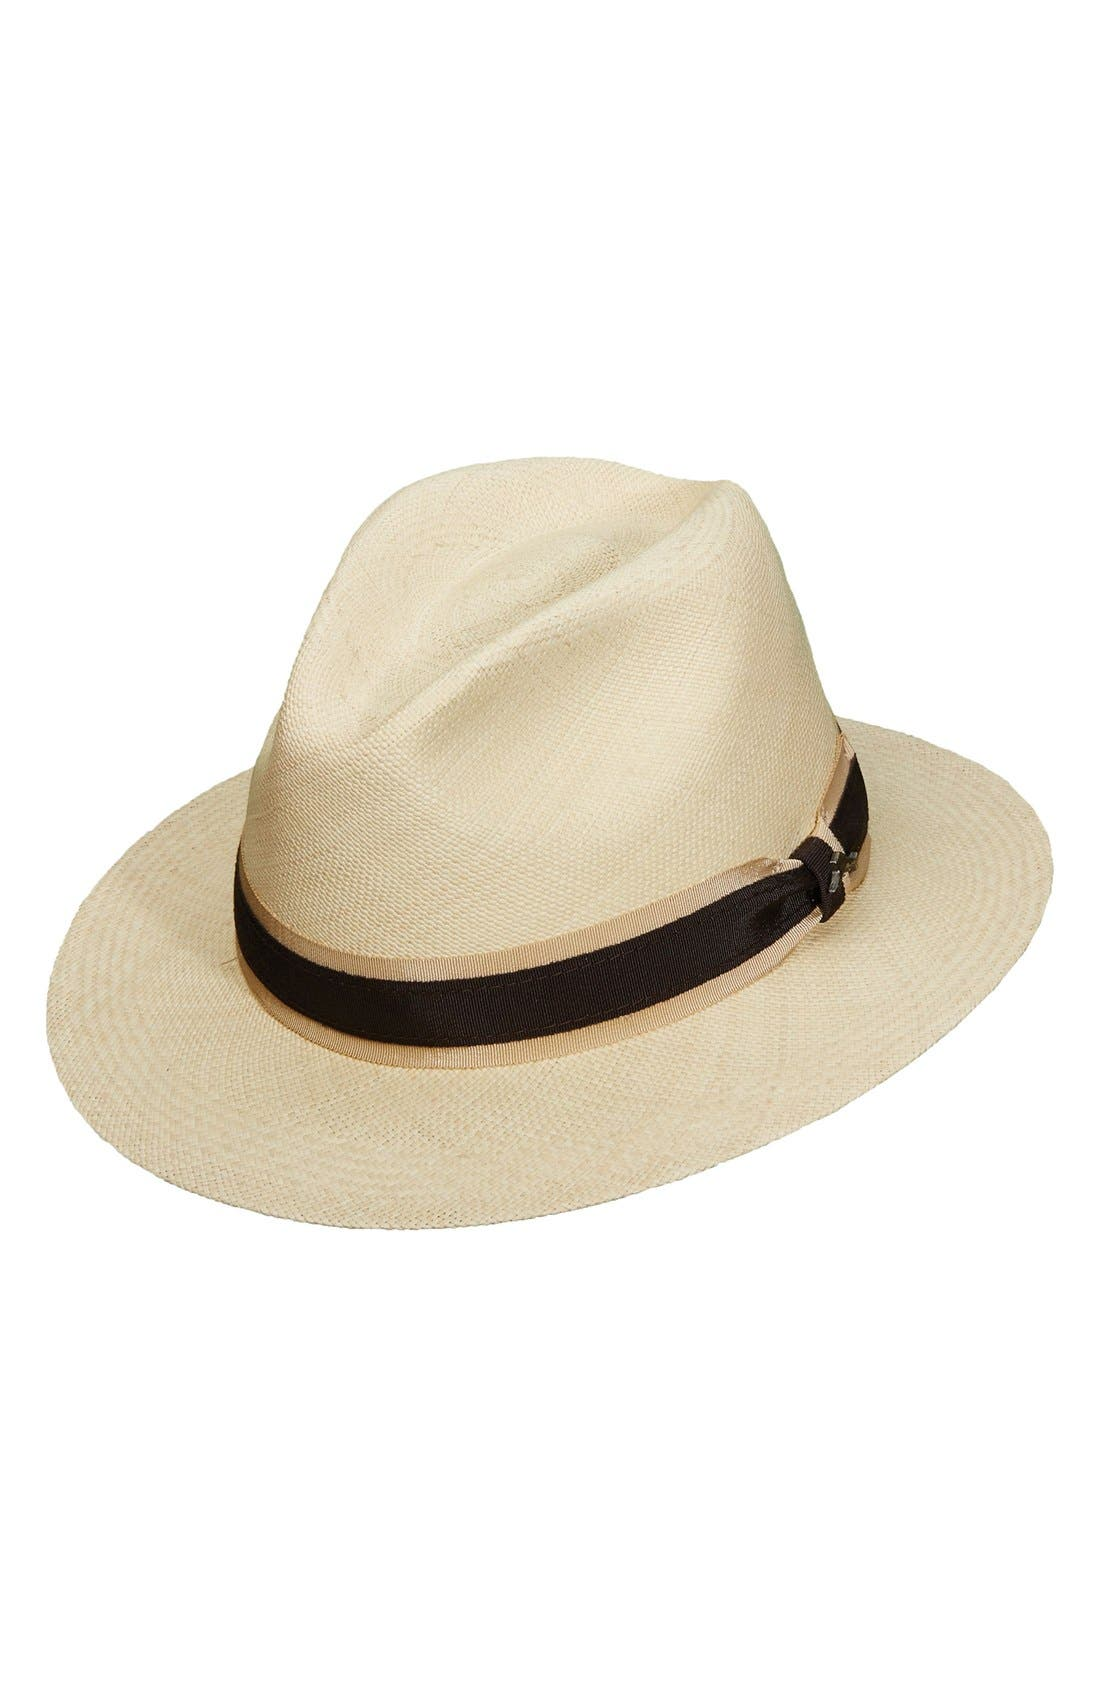 Panama Straw Safari Hat,                             Main thumbnail 1, color,